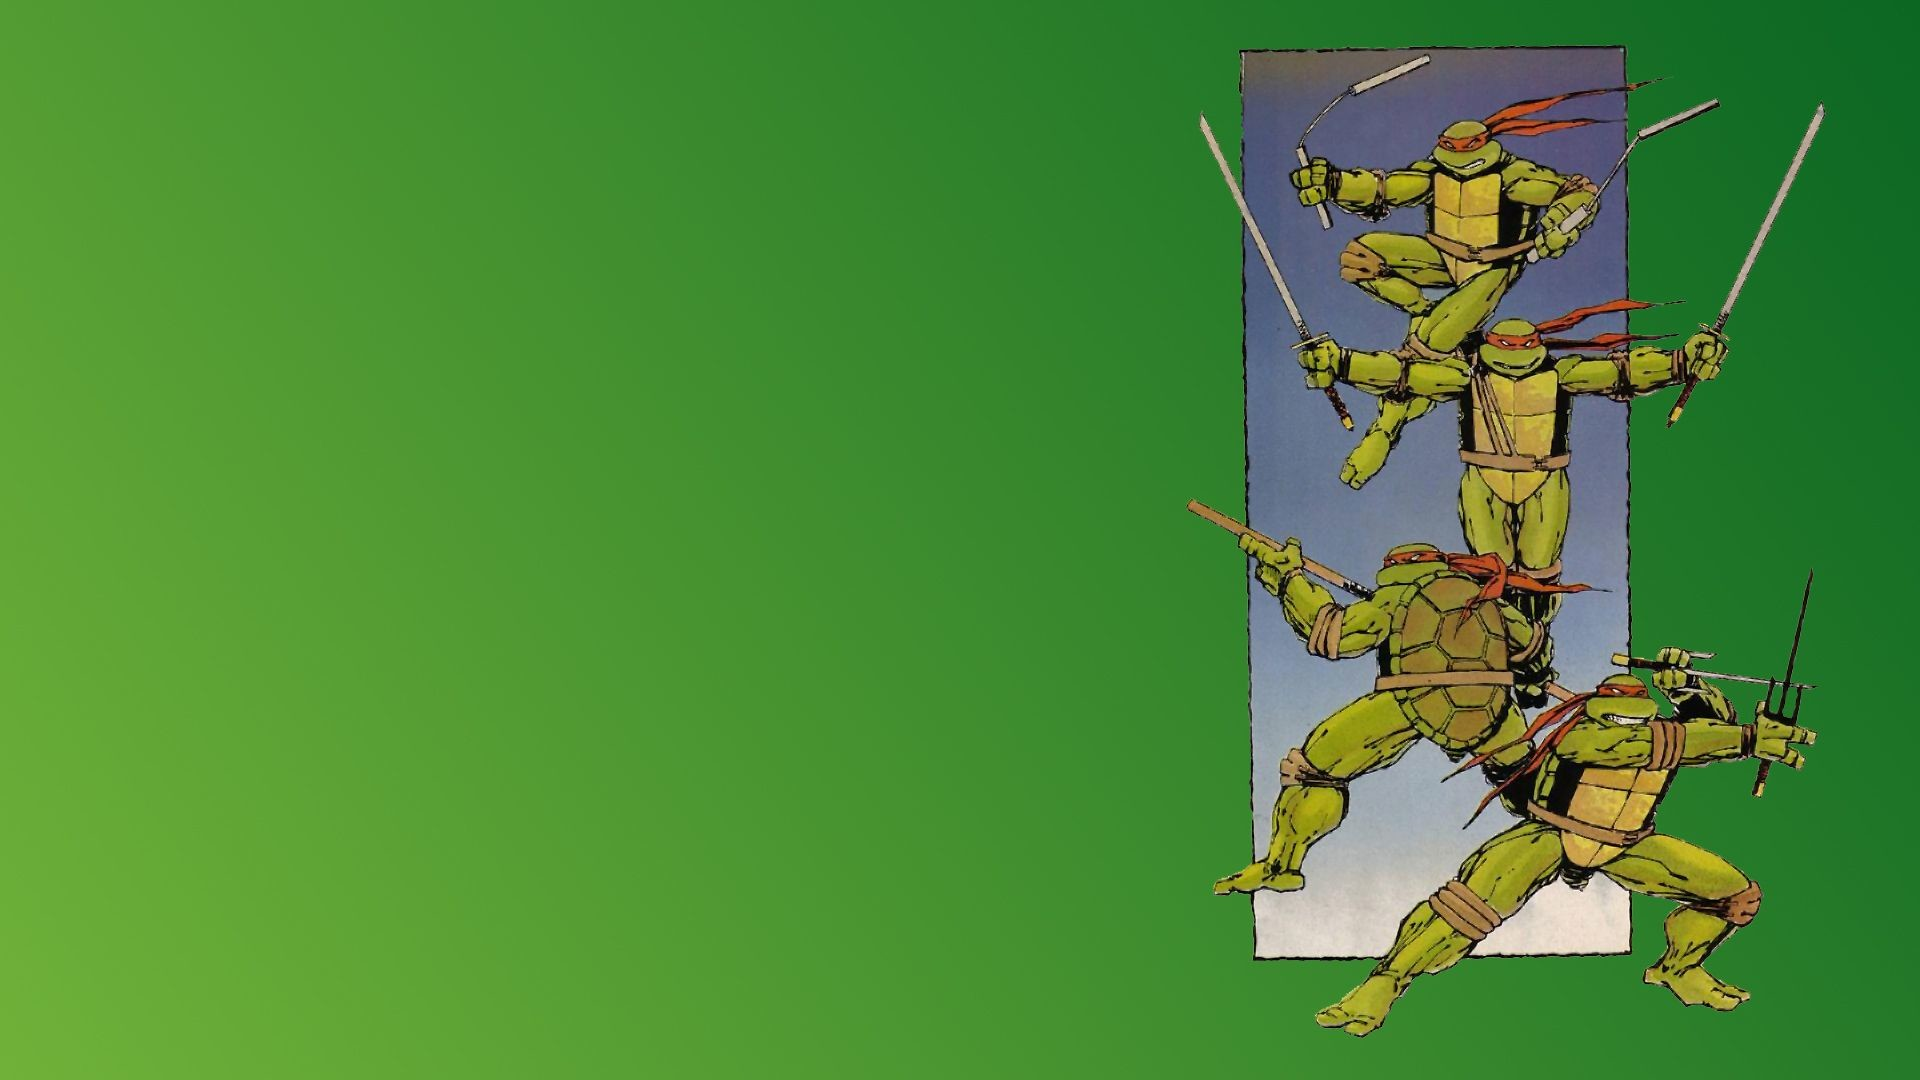 Res: 1920x1080, Cartoons Teenage Mutant Ninja Turtles wallpaper |  .